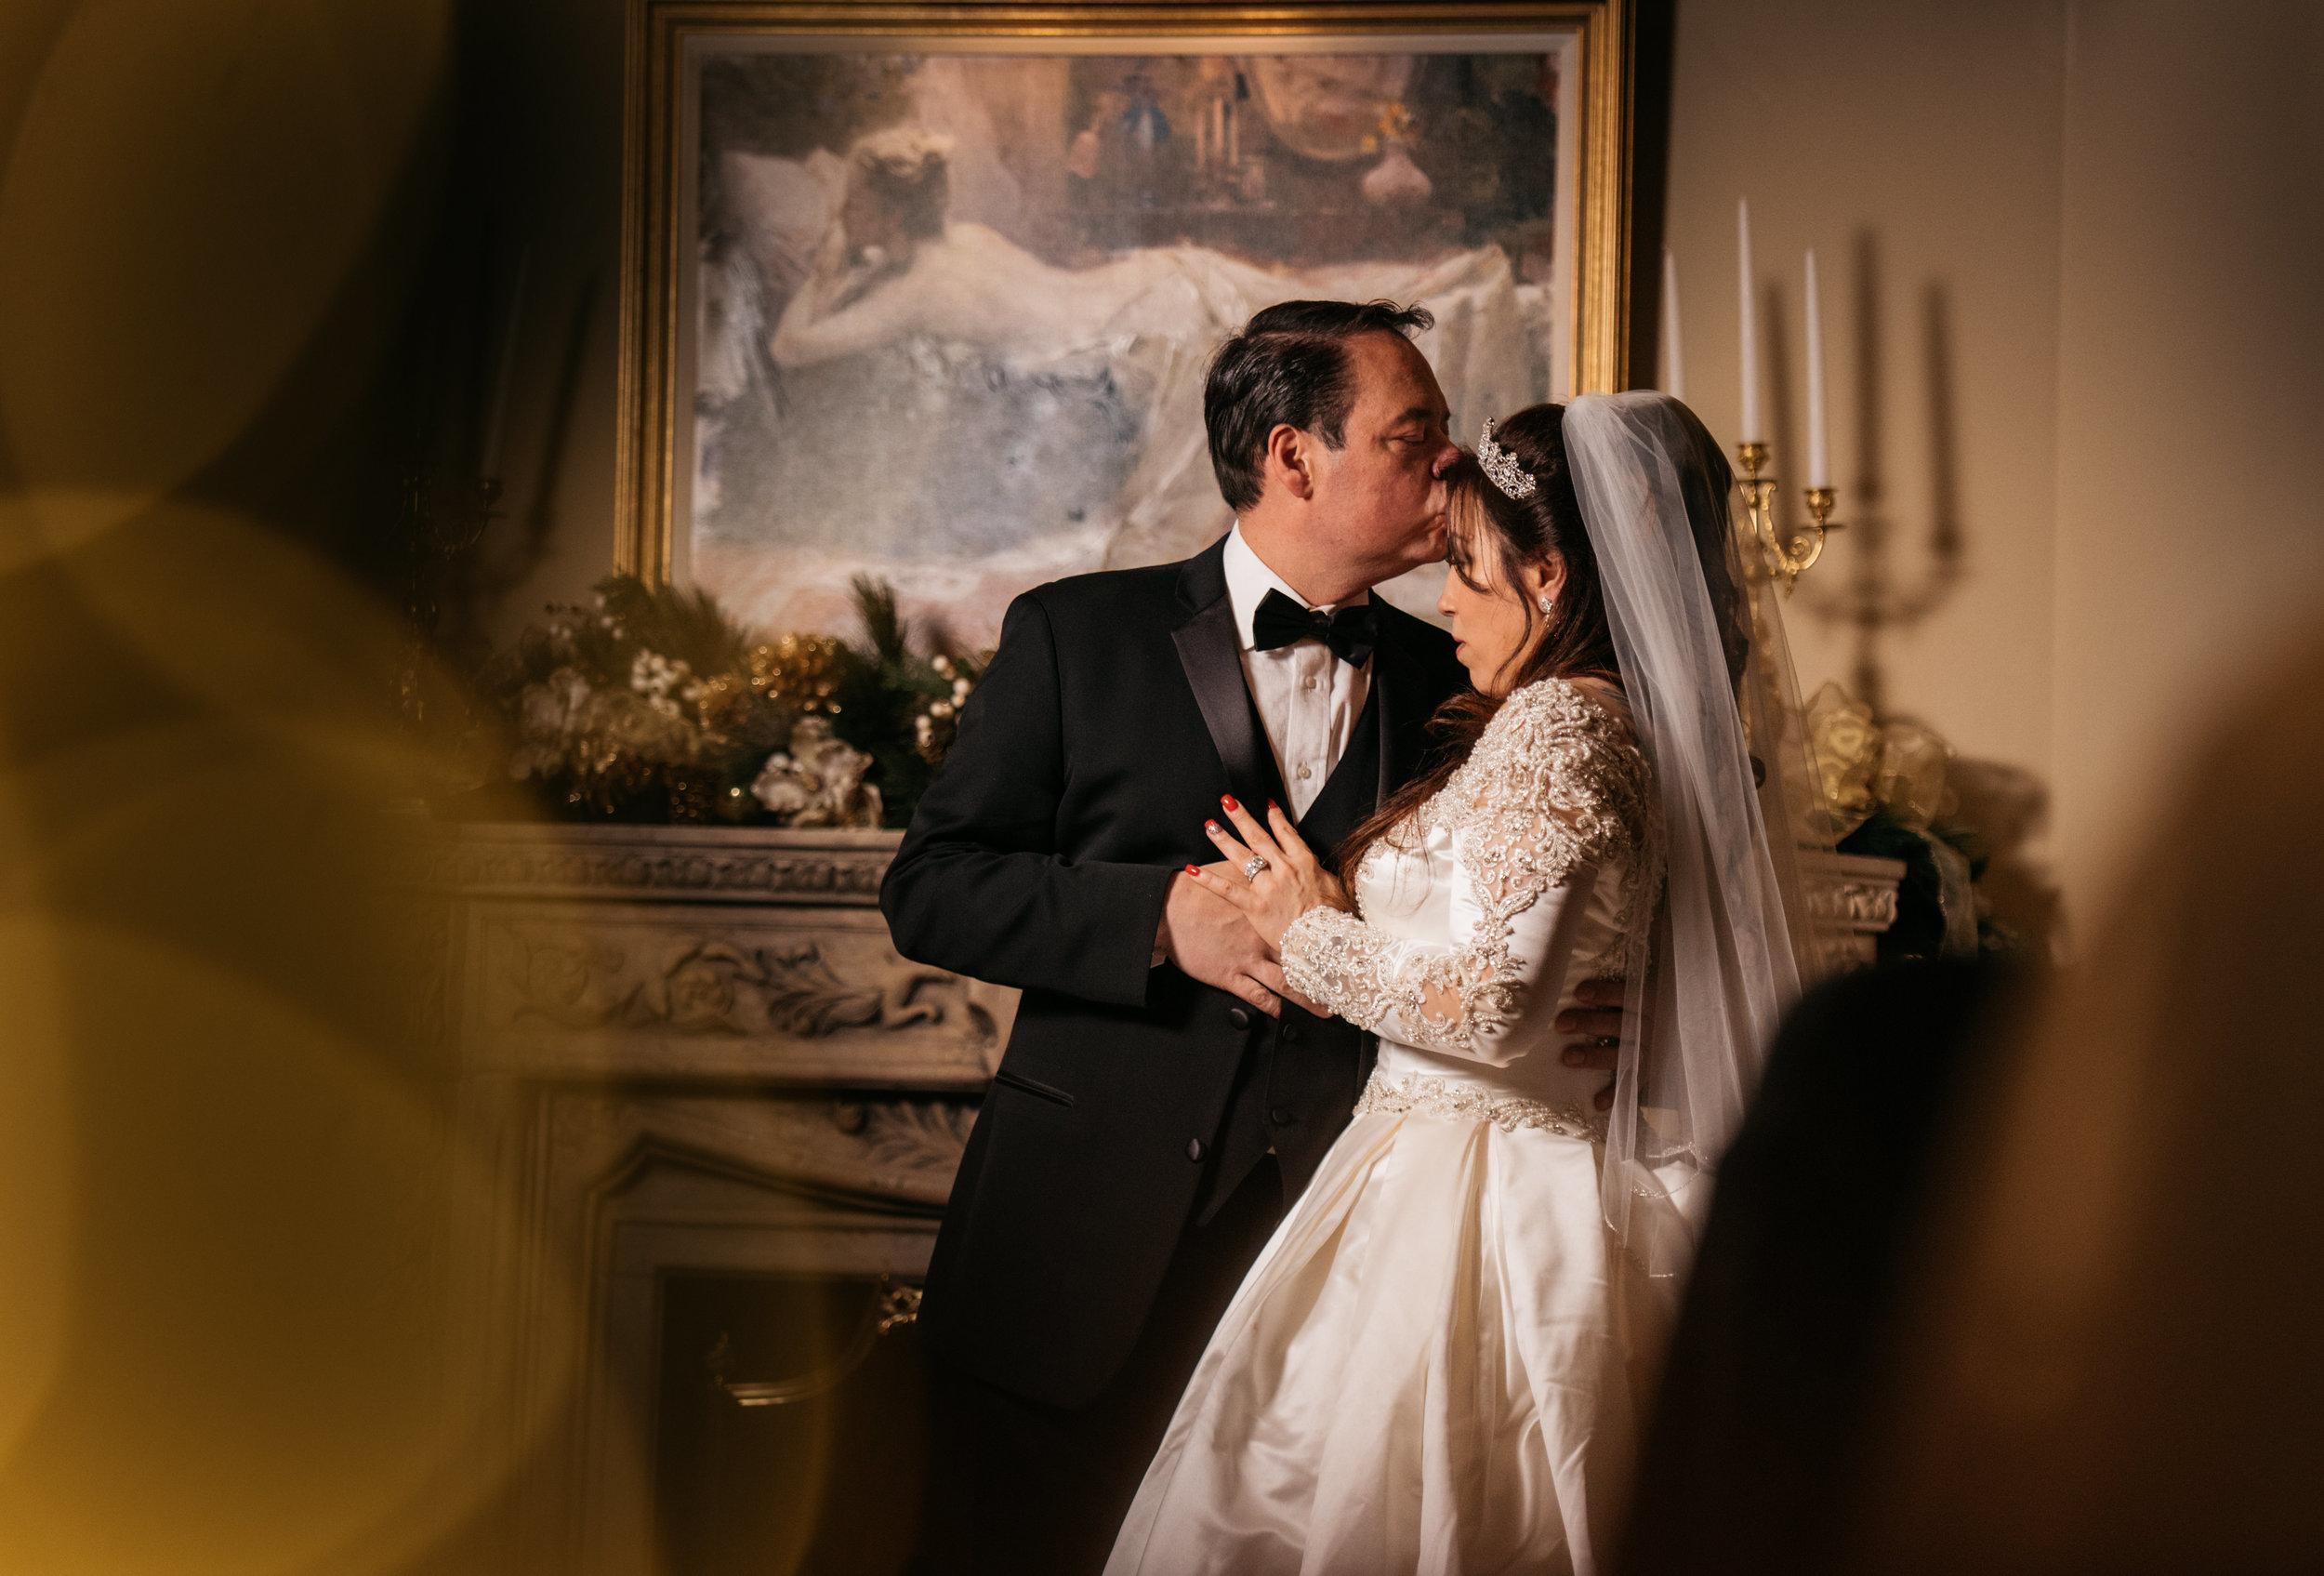 WeddingPhotos | NJPhotographer | Highlights-10-27.jpg